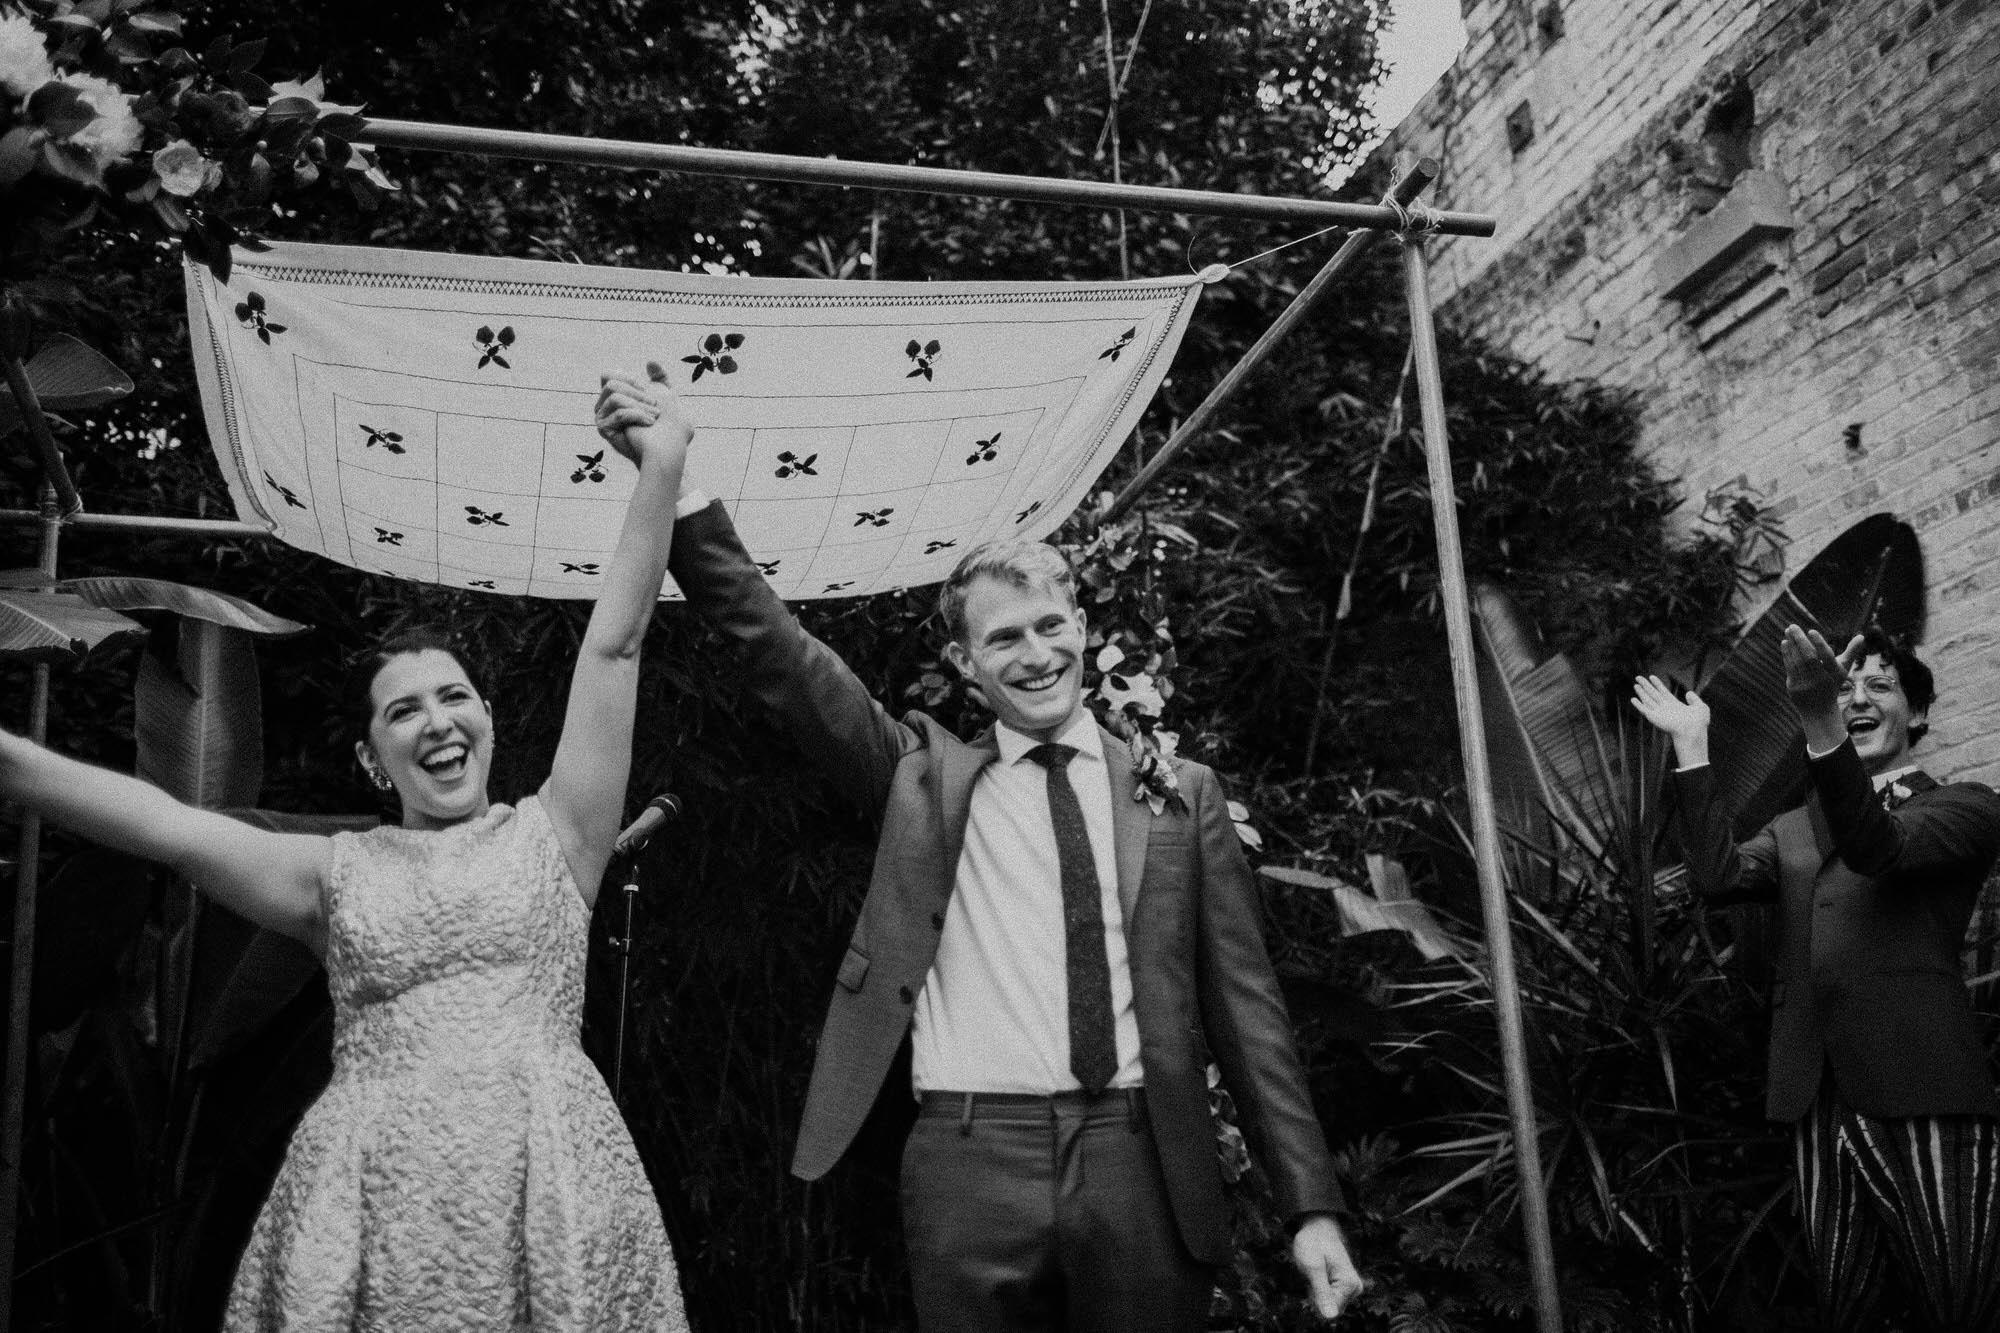 los-angeles-wedding-photographer-millwick-114.jpg